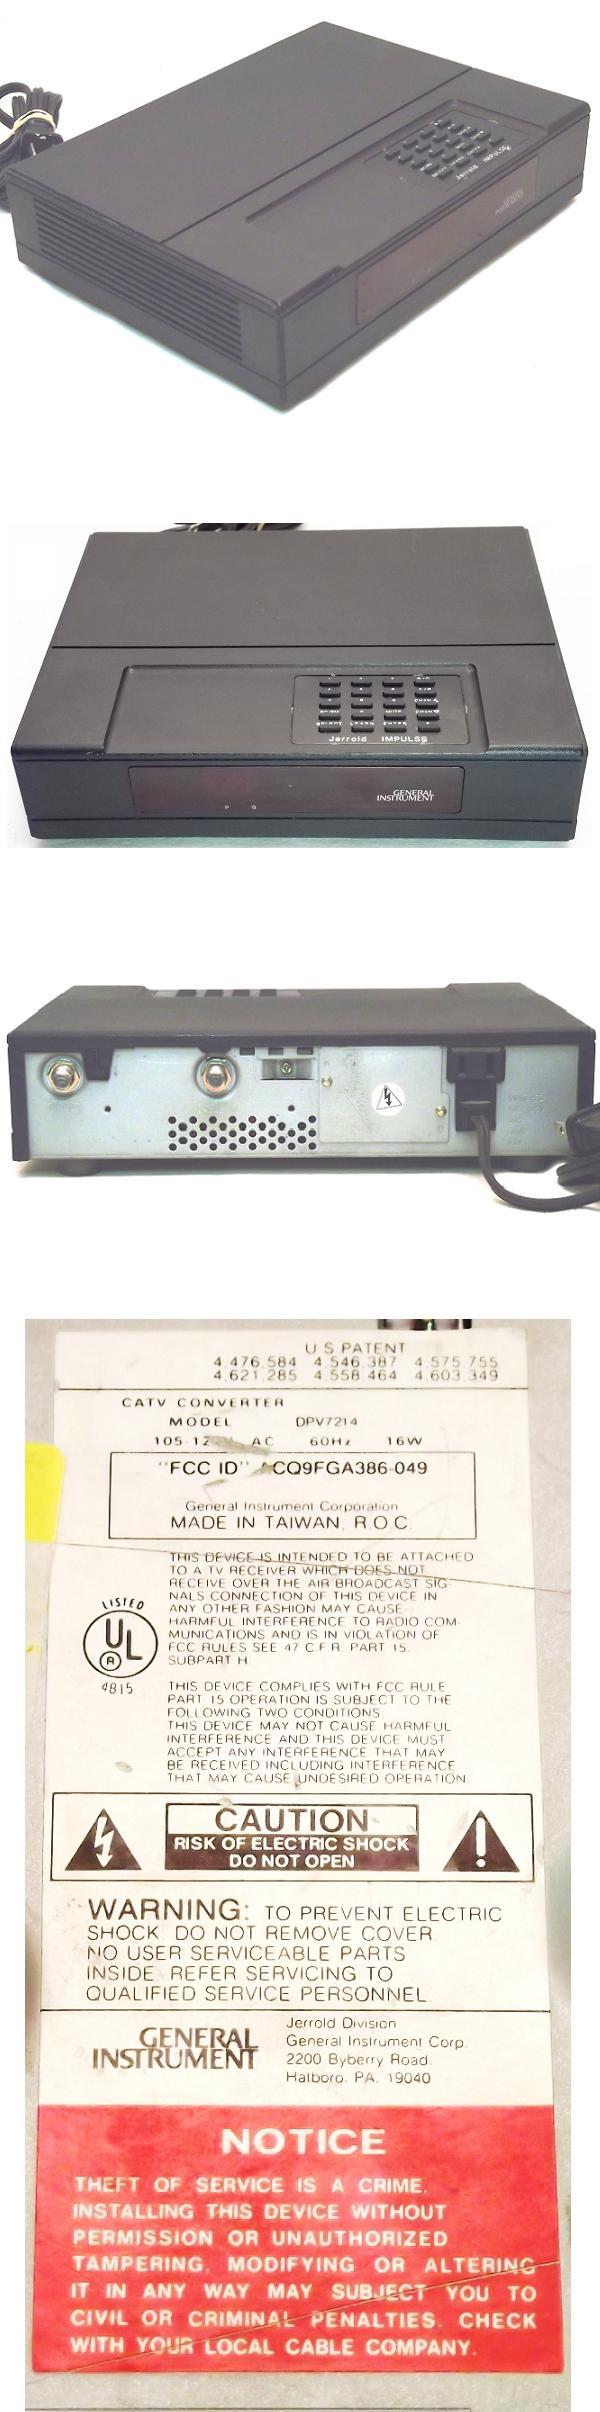 UHF interference on old TV - UK Vintage Radio Repair and